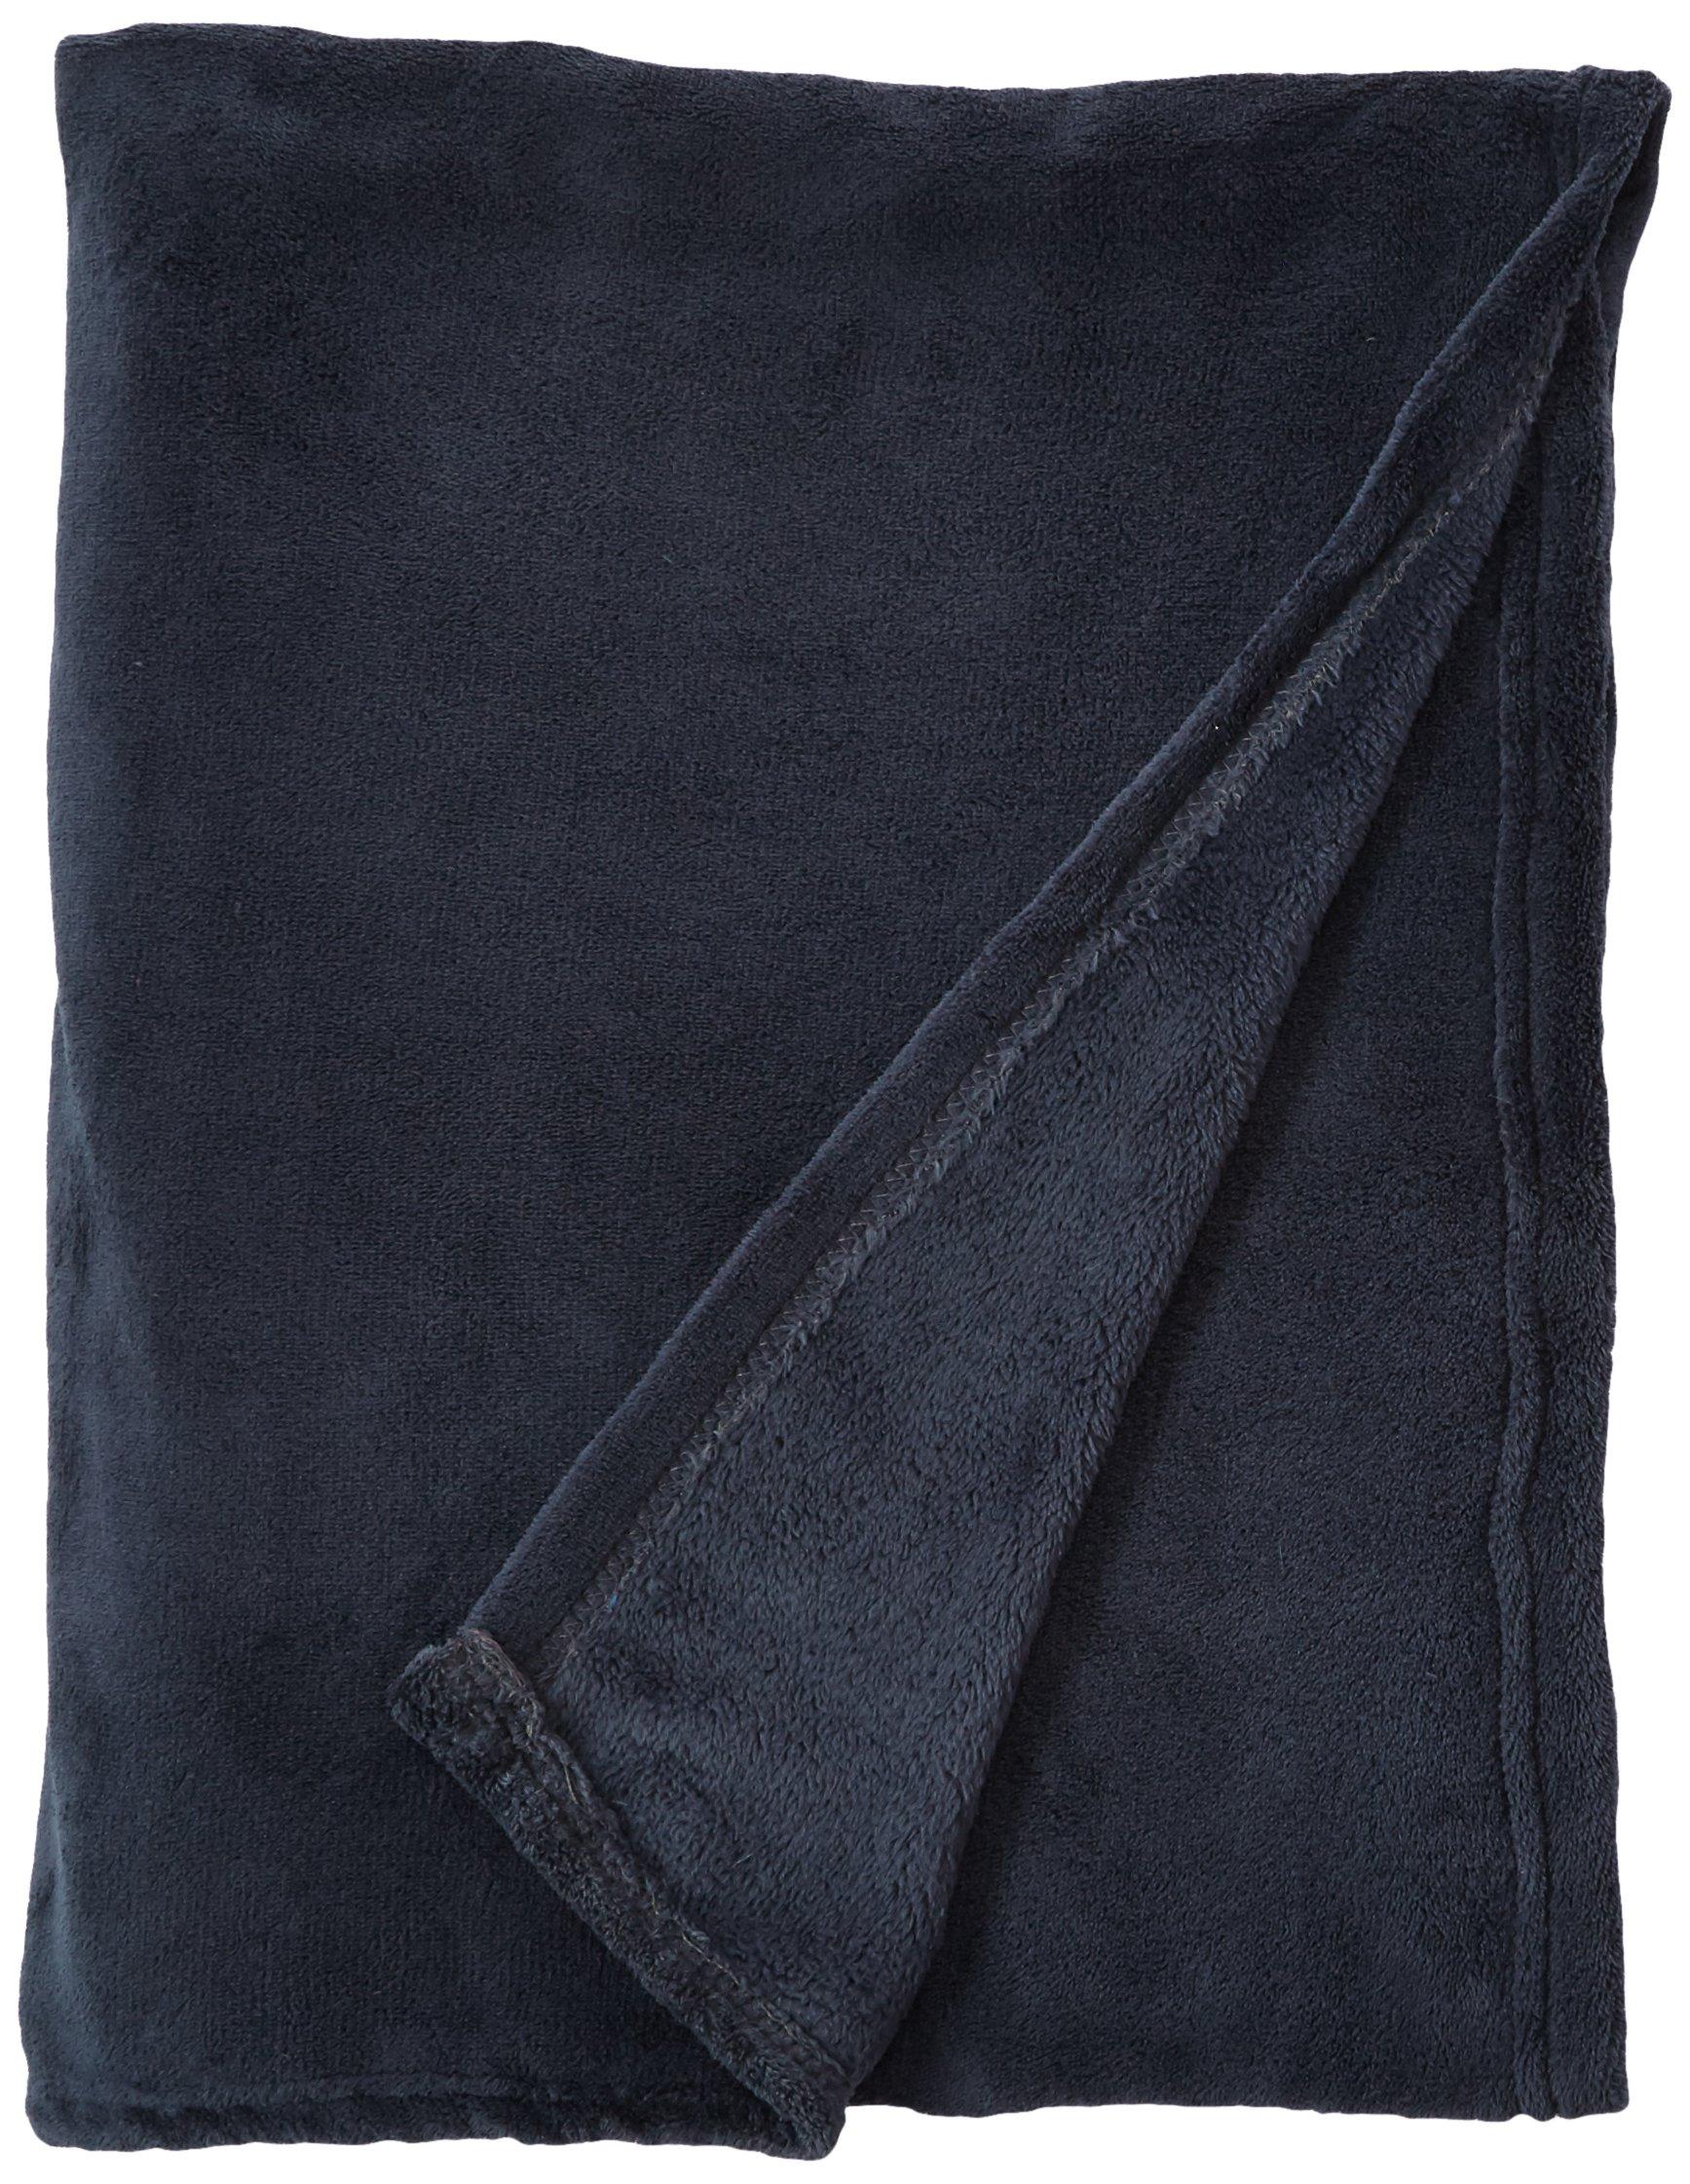 J & M Home Fashions Solid India Ink Plush Fleece Throw Blanket, 50'' x 60'', Gray